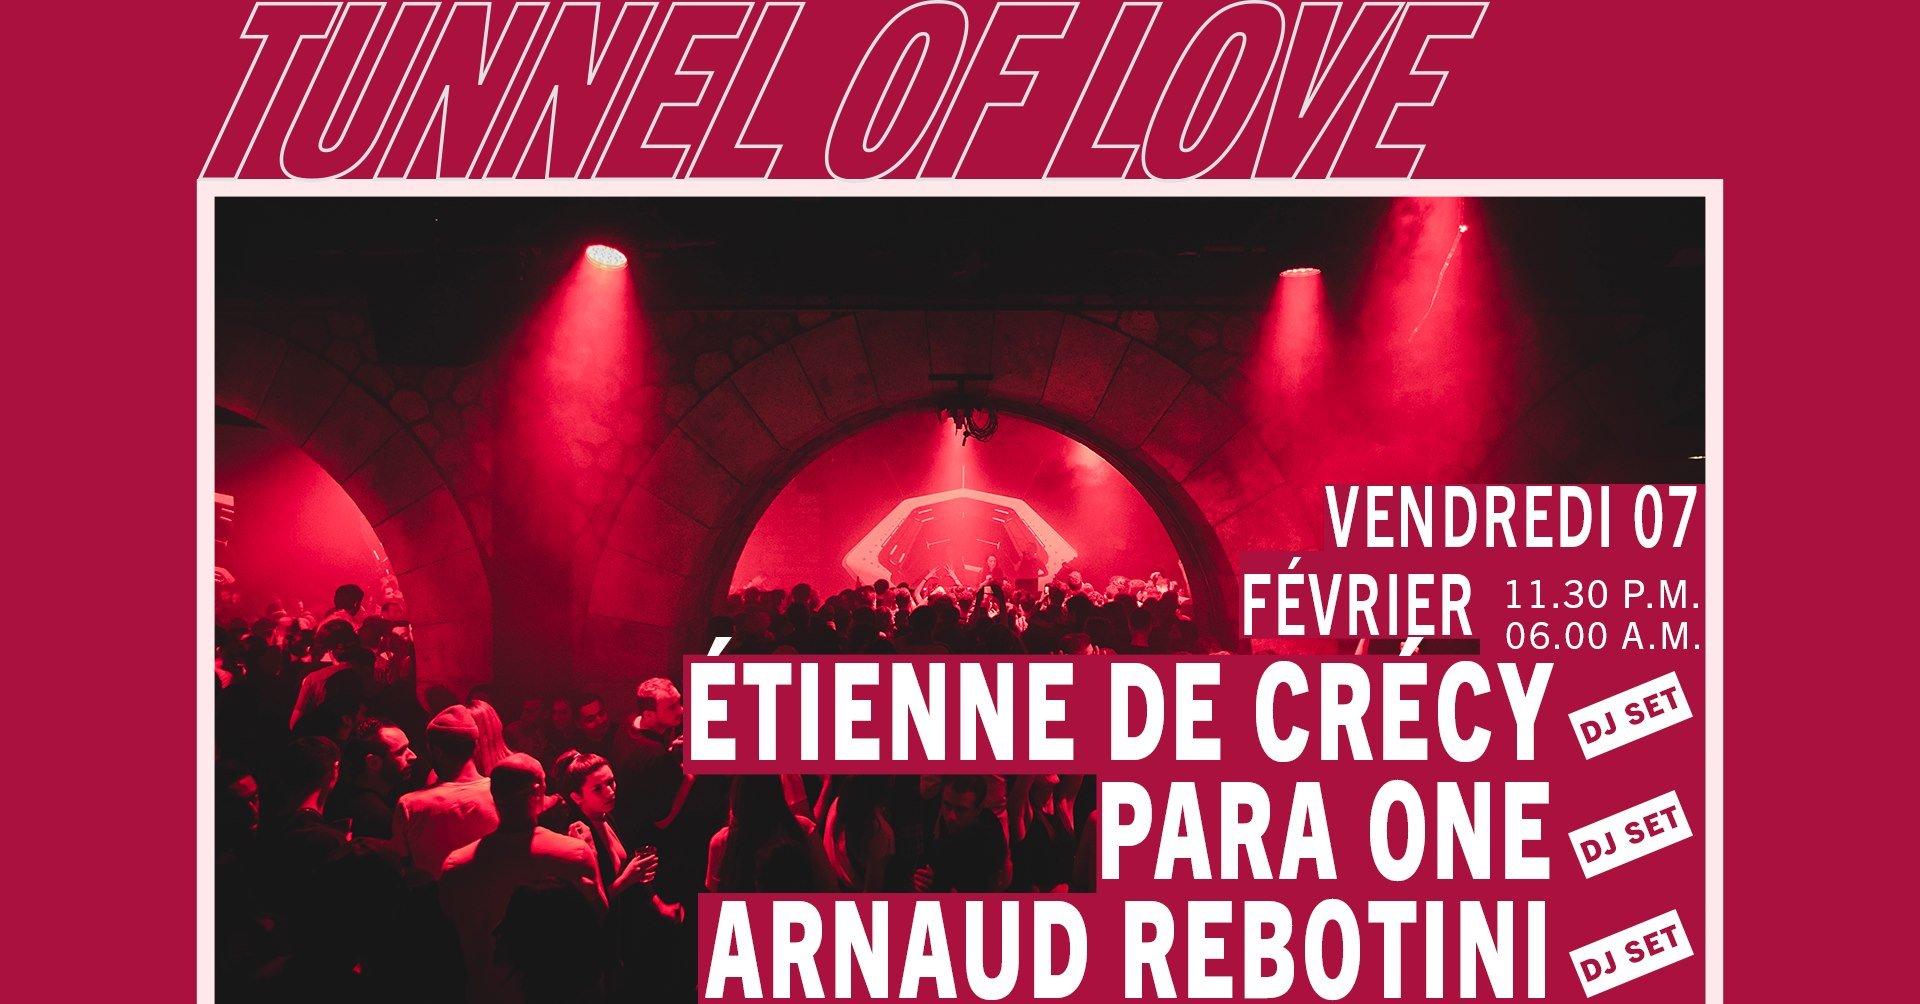 Tunnel Of Love : Étienne de Crécy, Para One & Arnaud Rebotini